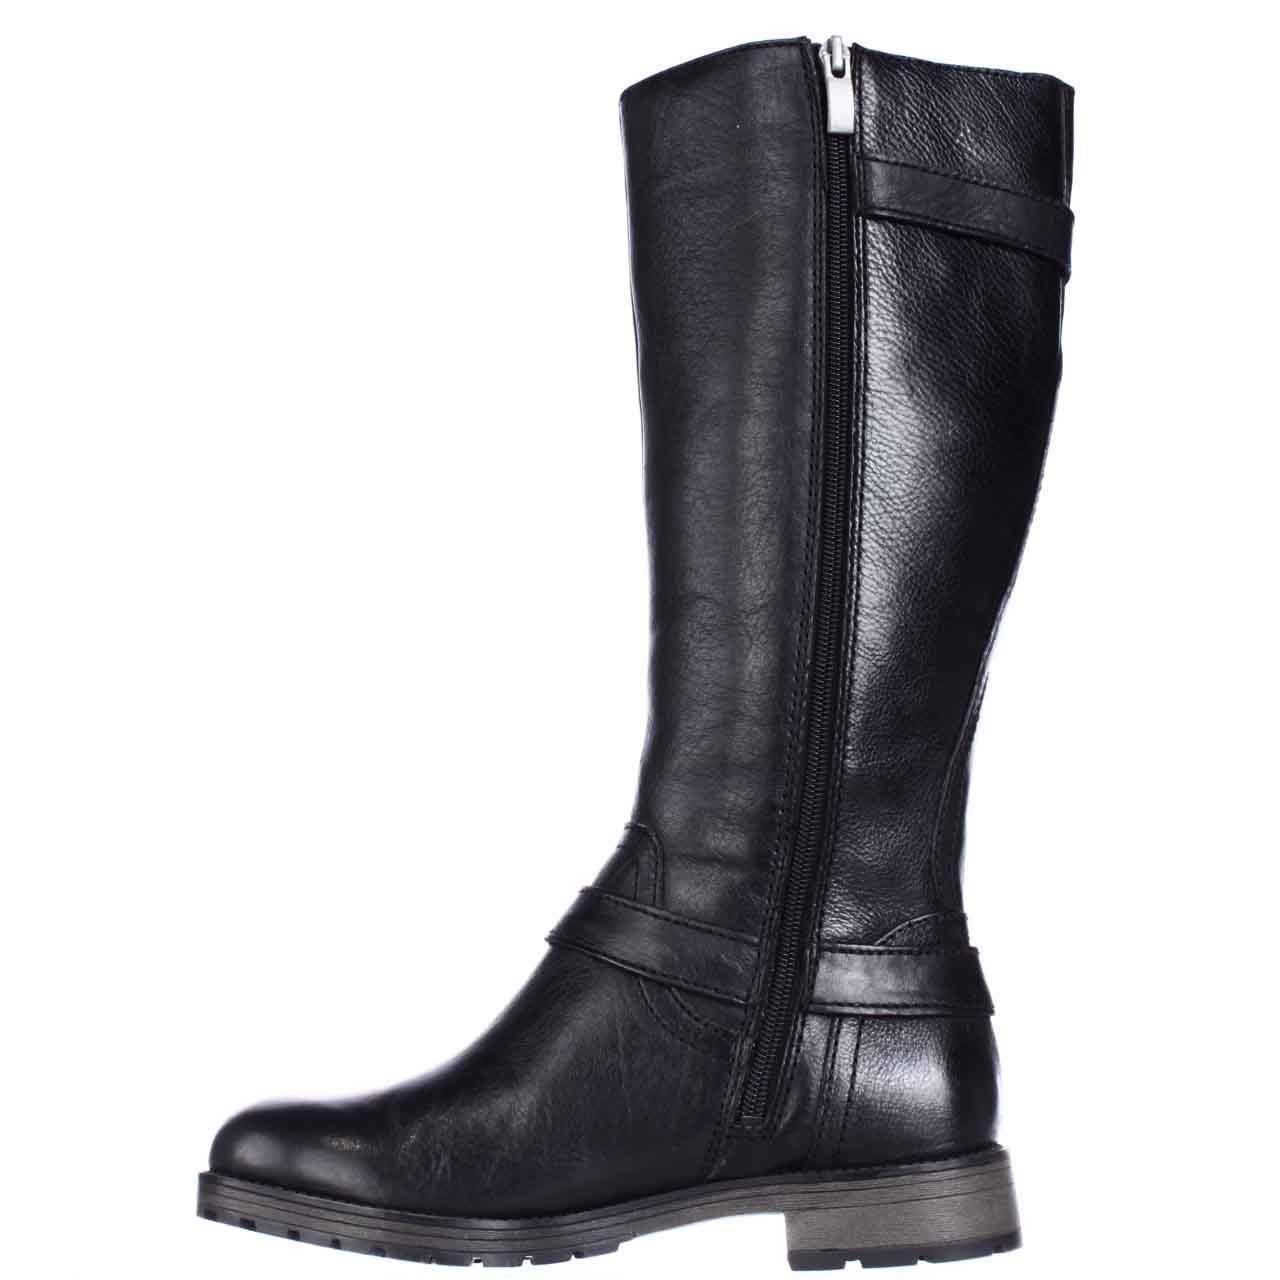 Womens naturalizer Tanita Wide Calf Lug Sole Riding Boots - Black